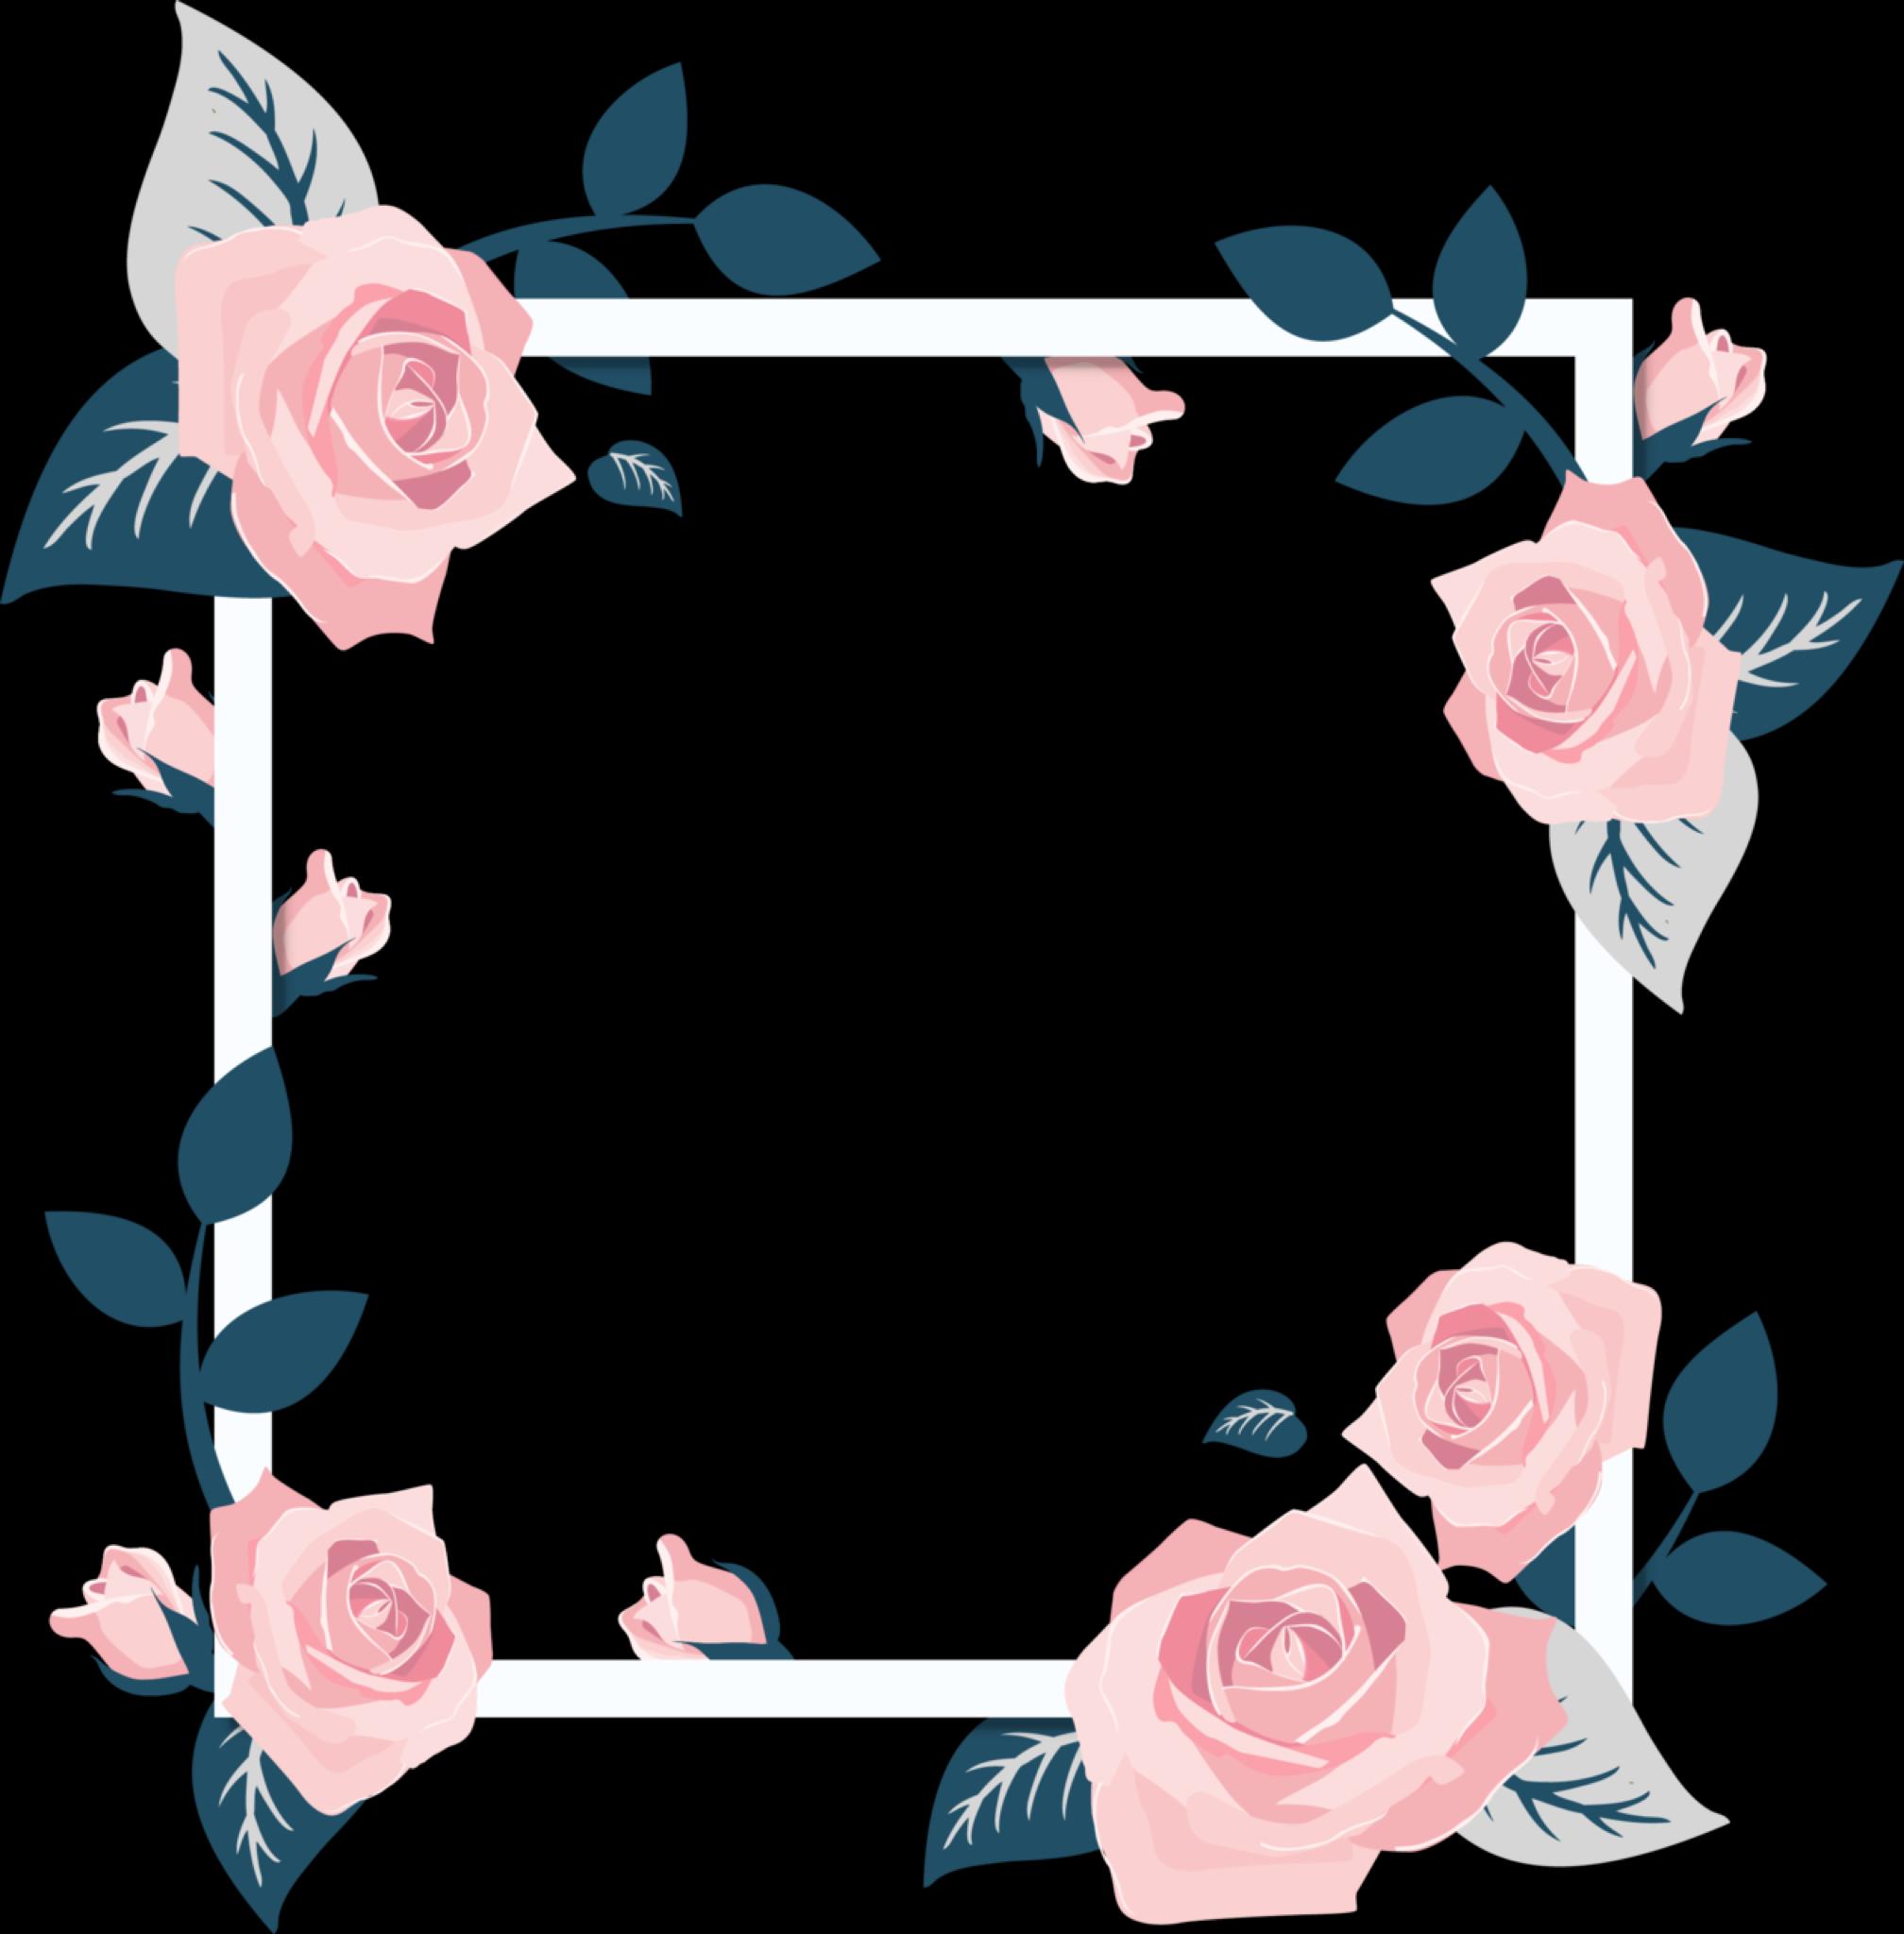 Frame Square Squareframe Flower Flowers Flowerframe White Whiteframe Roses Pink Blue Cute Aesthetic Overl Pola Bunga Kartu Bunga Kartu Pernikahan